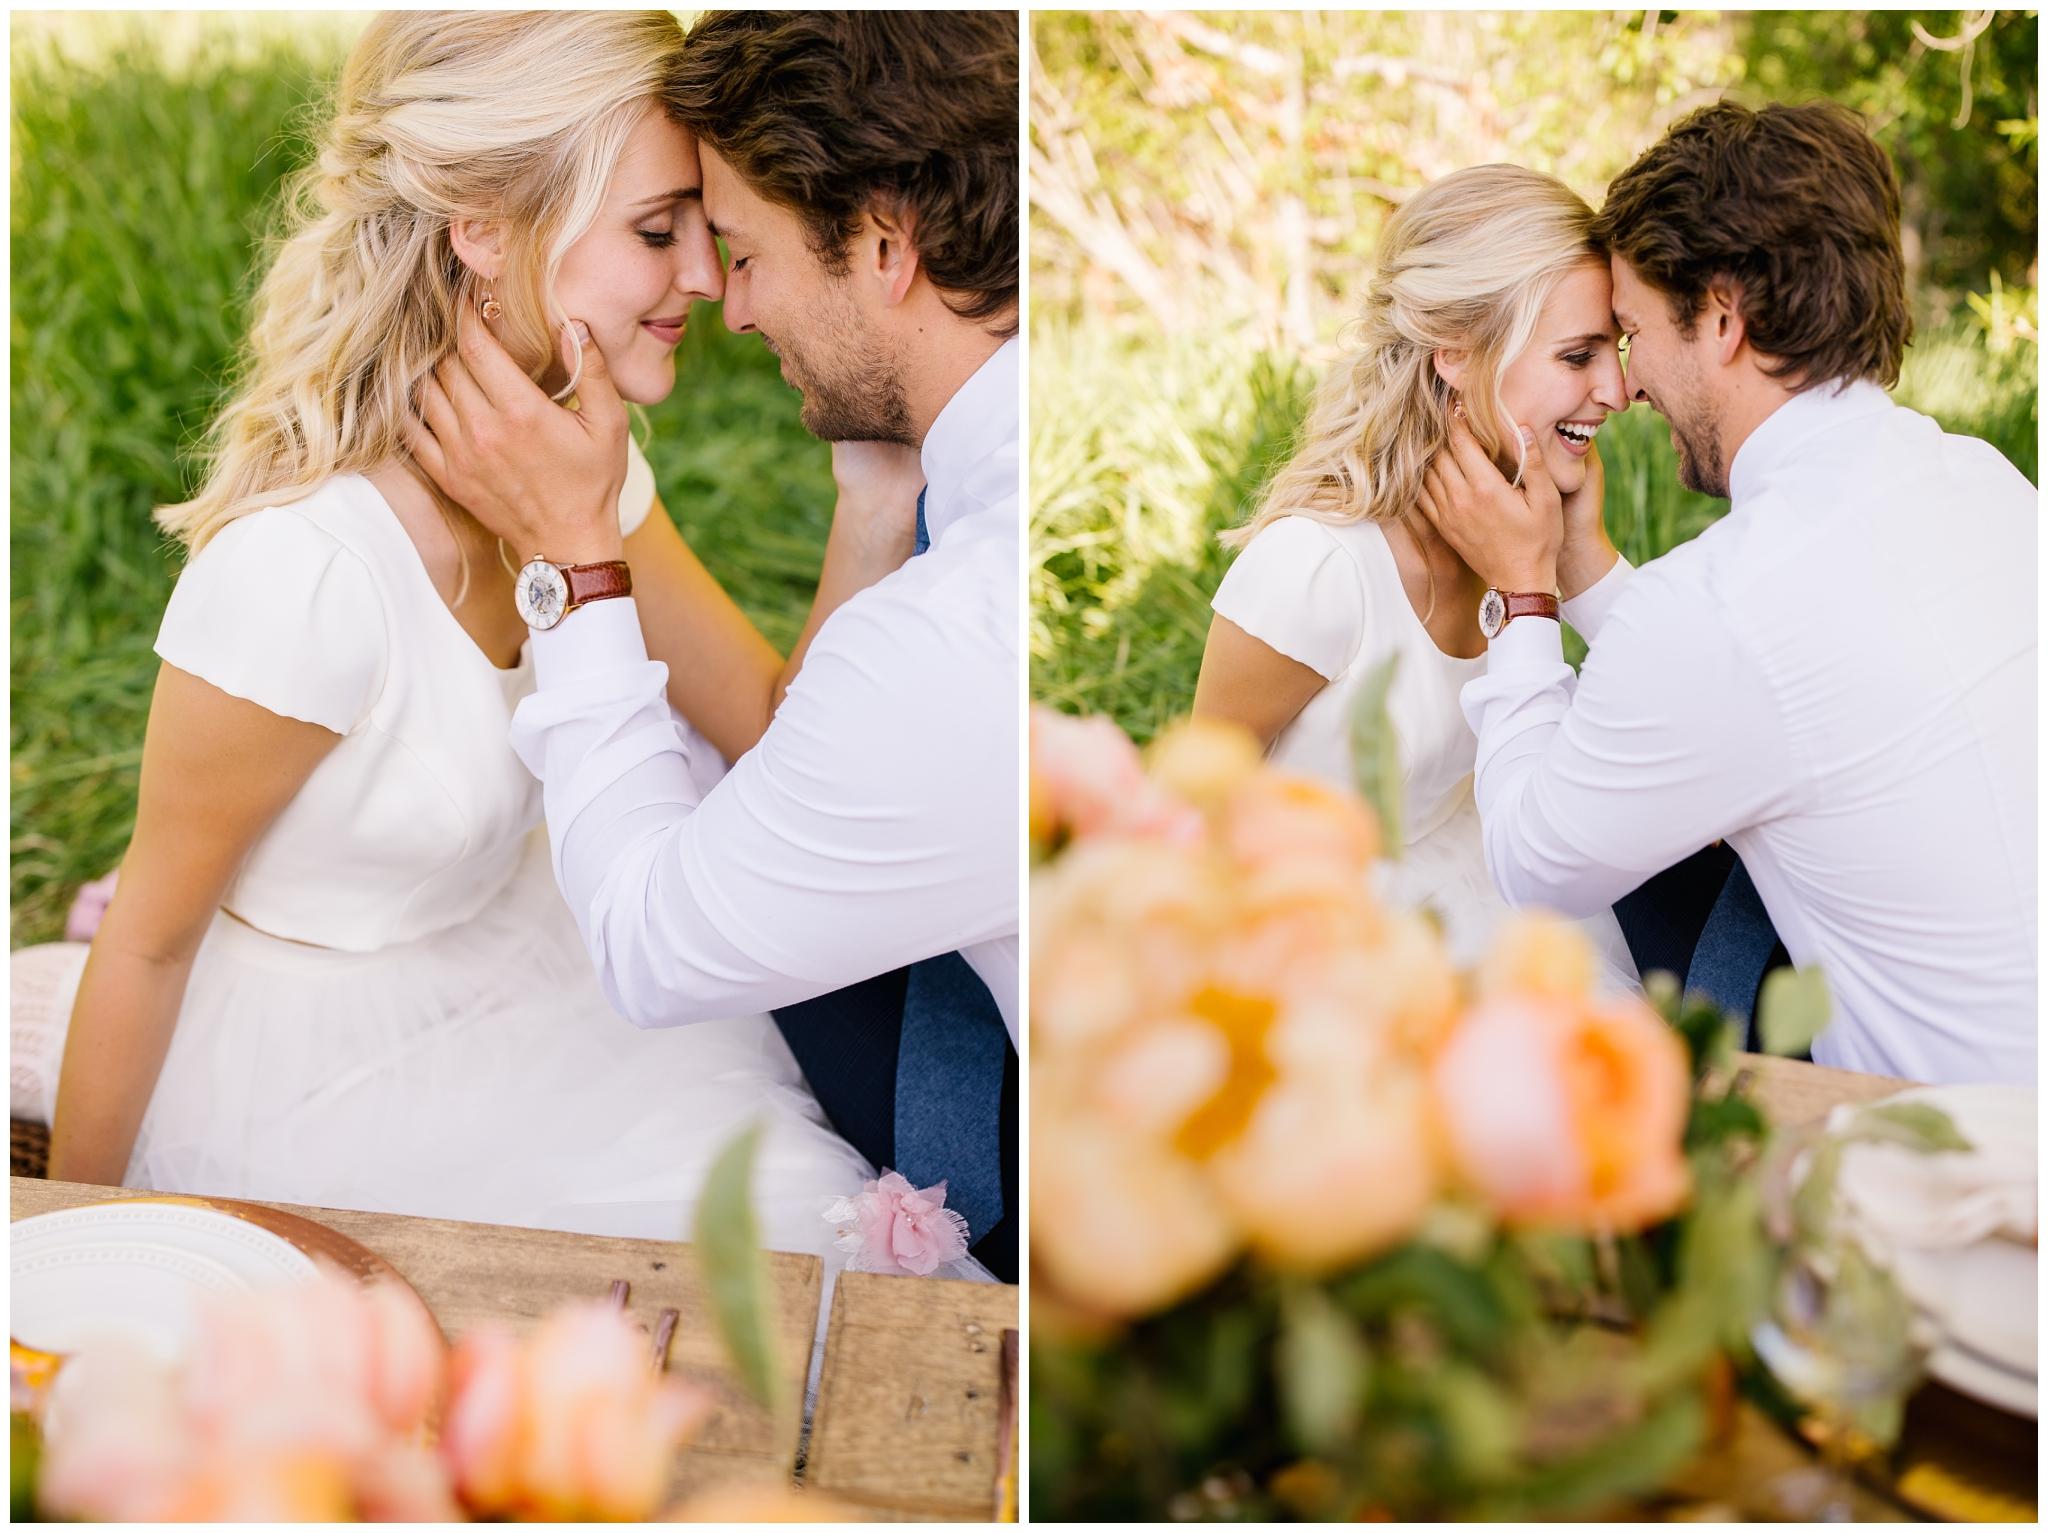 Lizzie-B-Imagery-Utah-Wedding-Photographer-Park-City-Photographer_0030.jpg